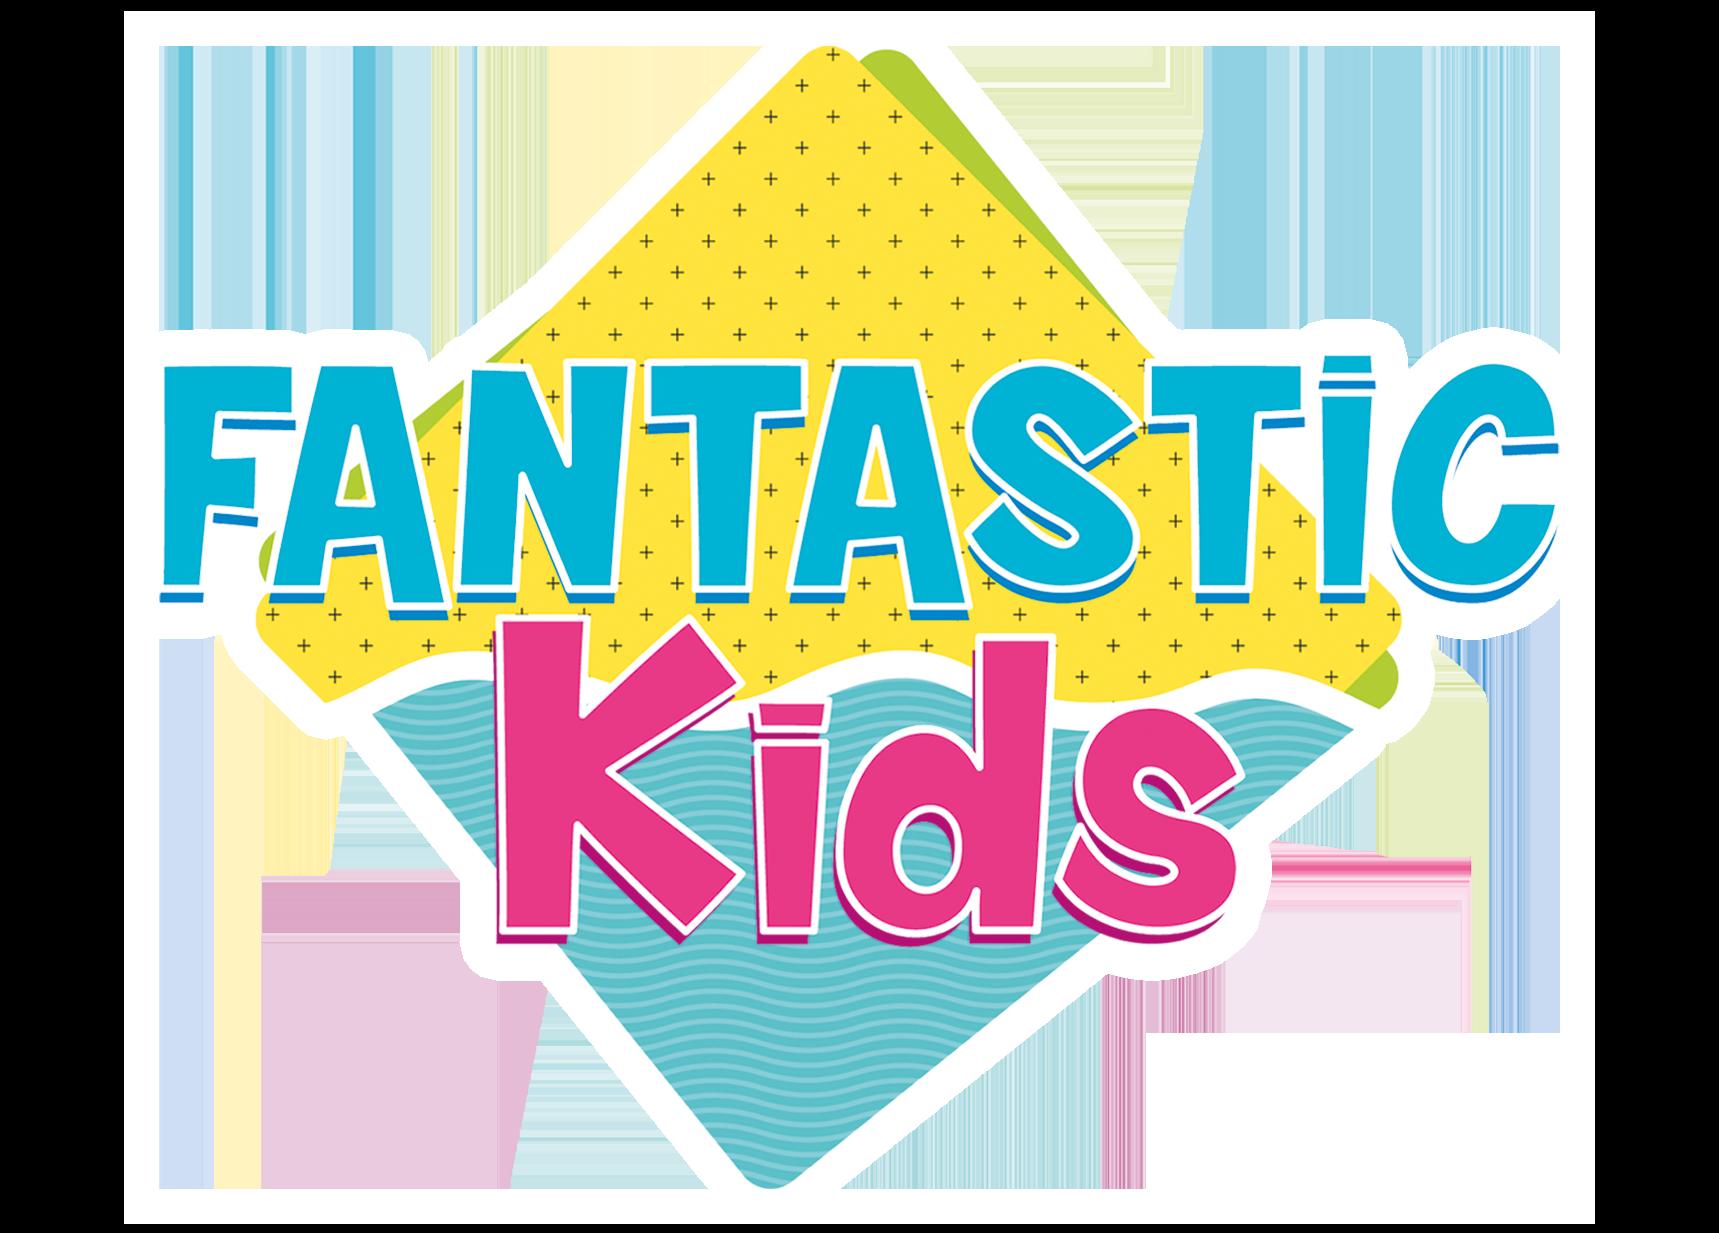 Fantastic Kids